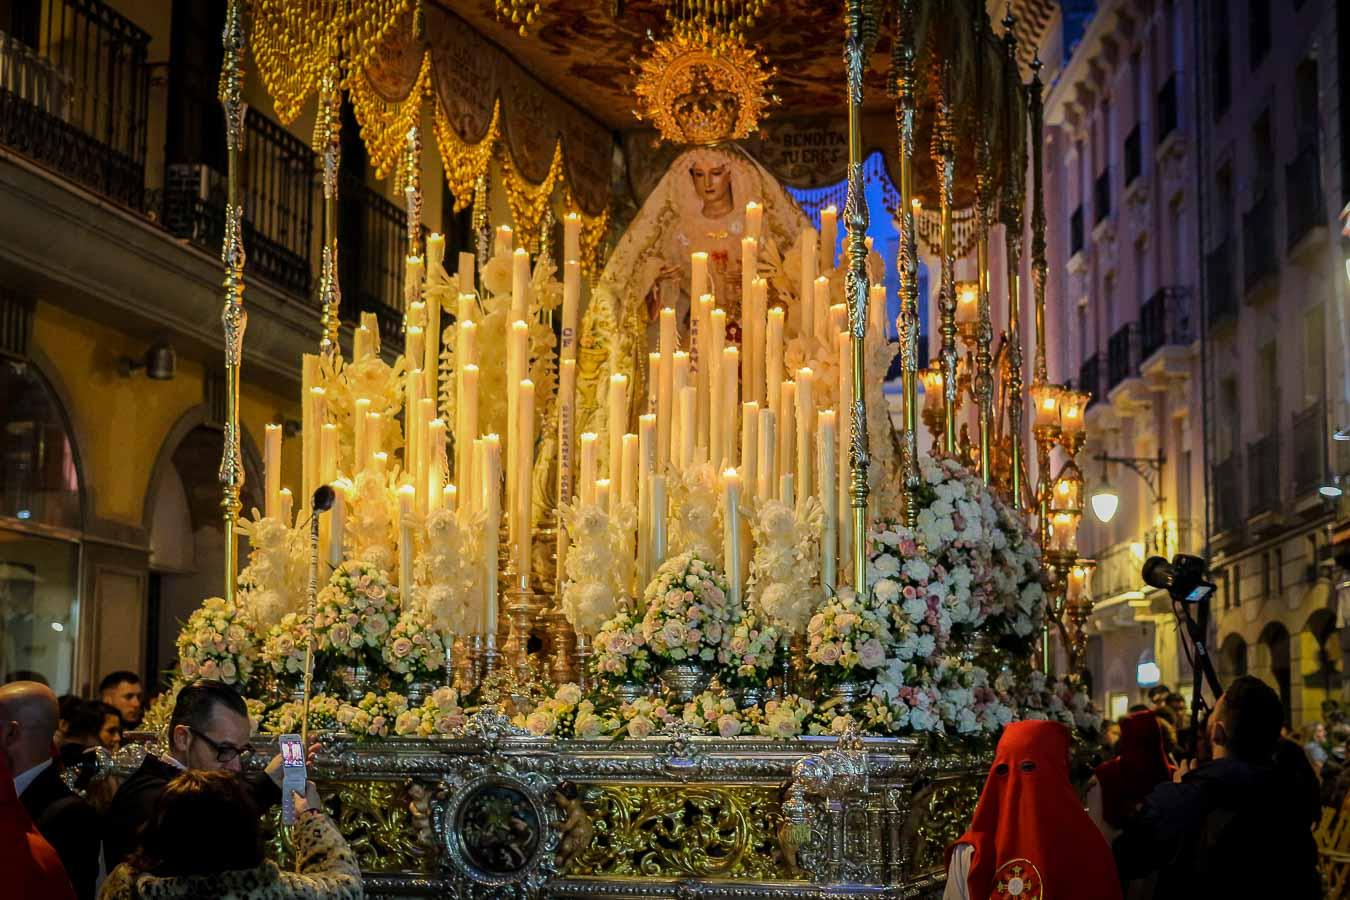 Trono Semana Santa en Granada, España. Procesión